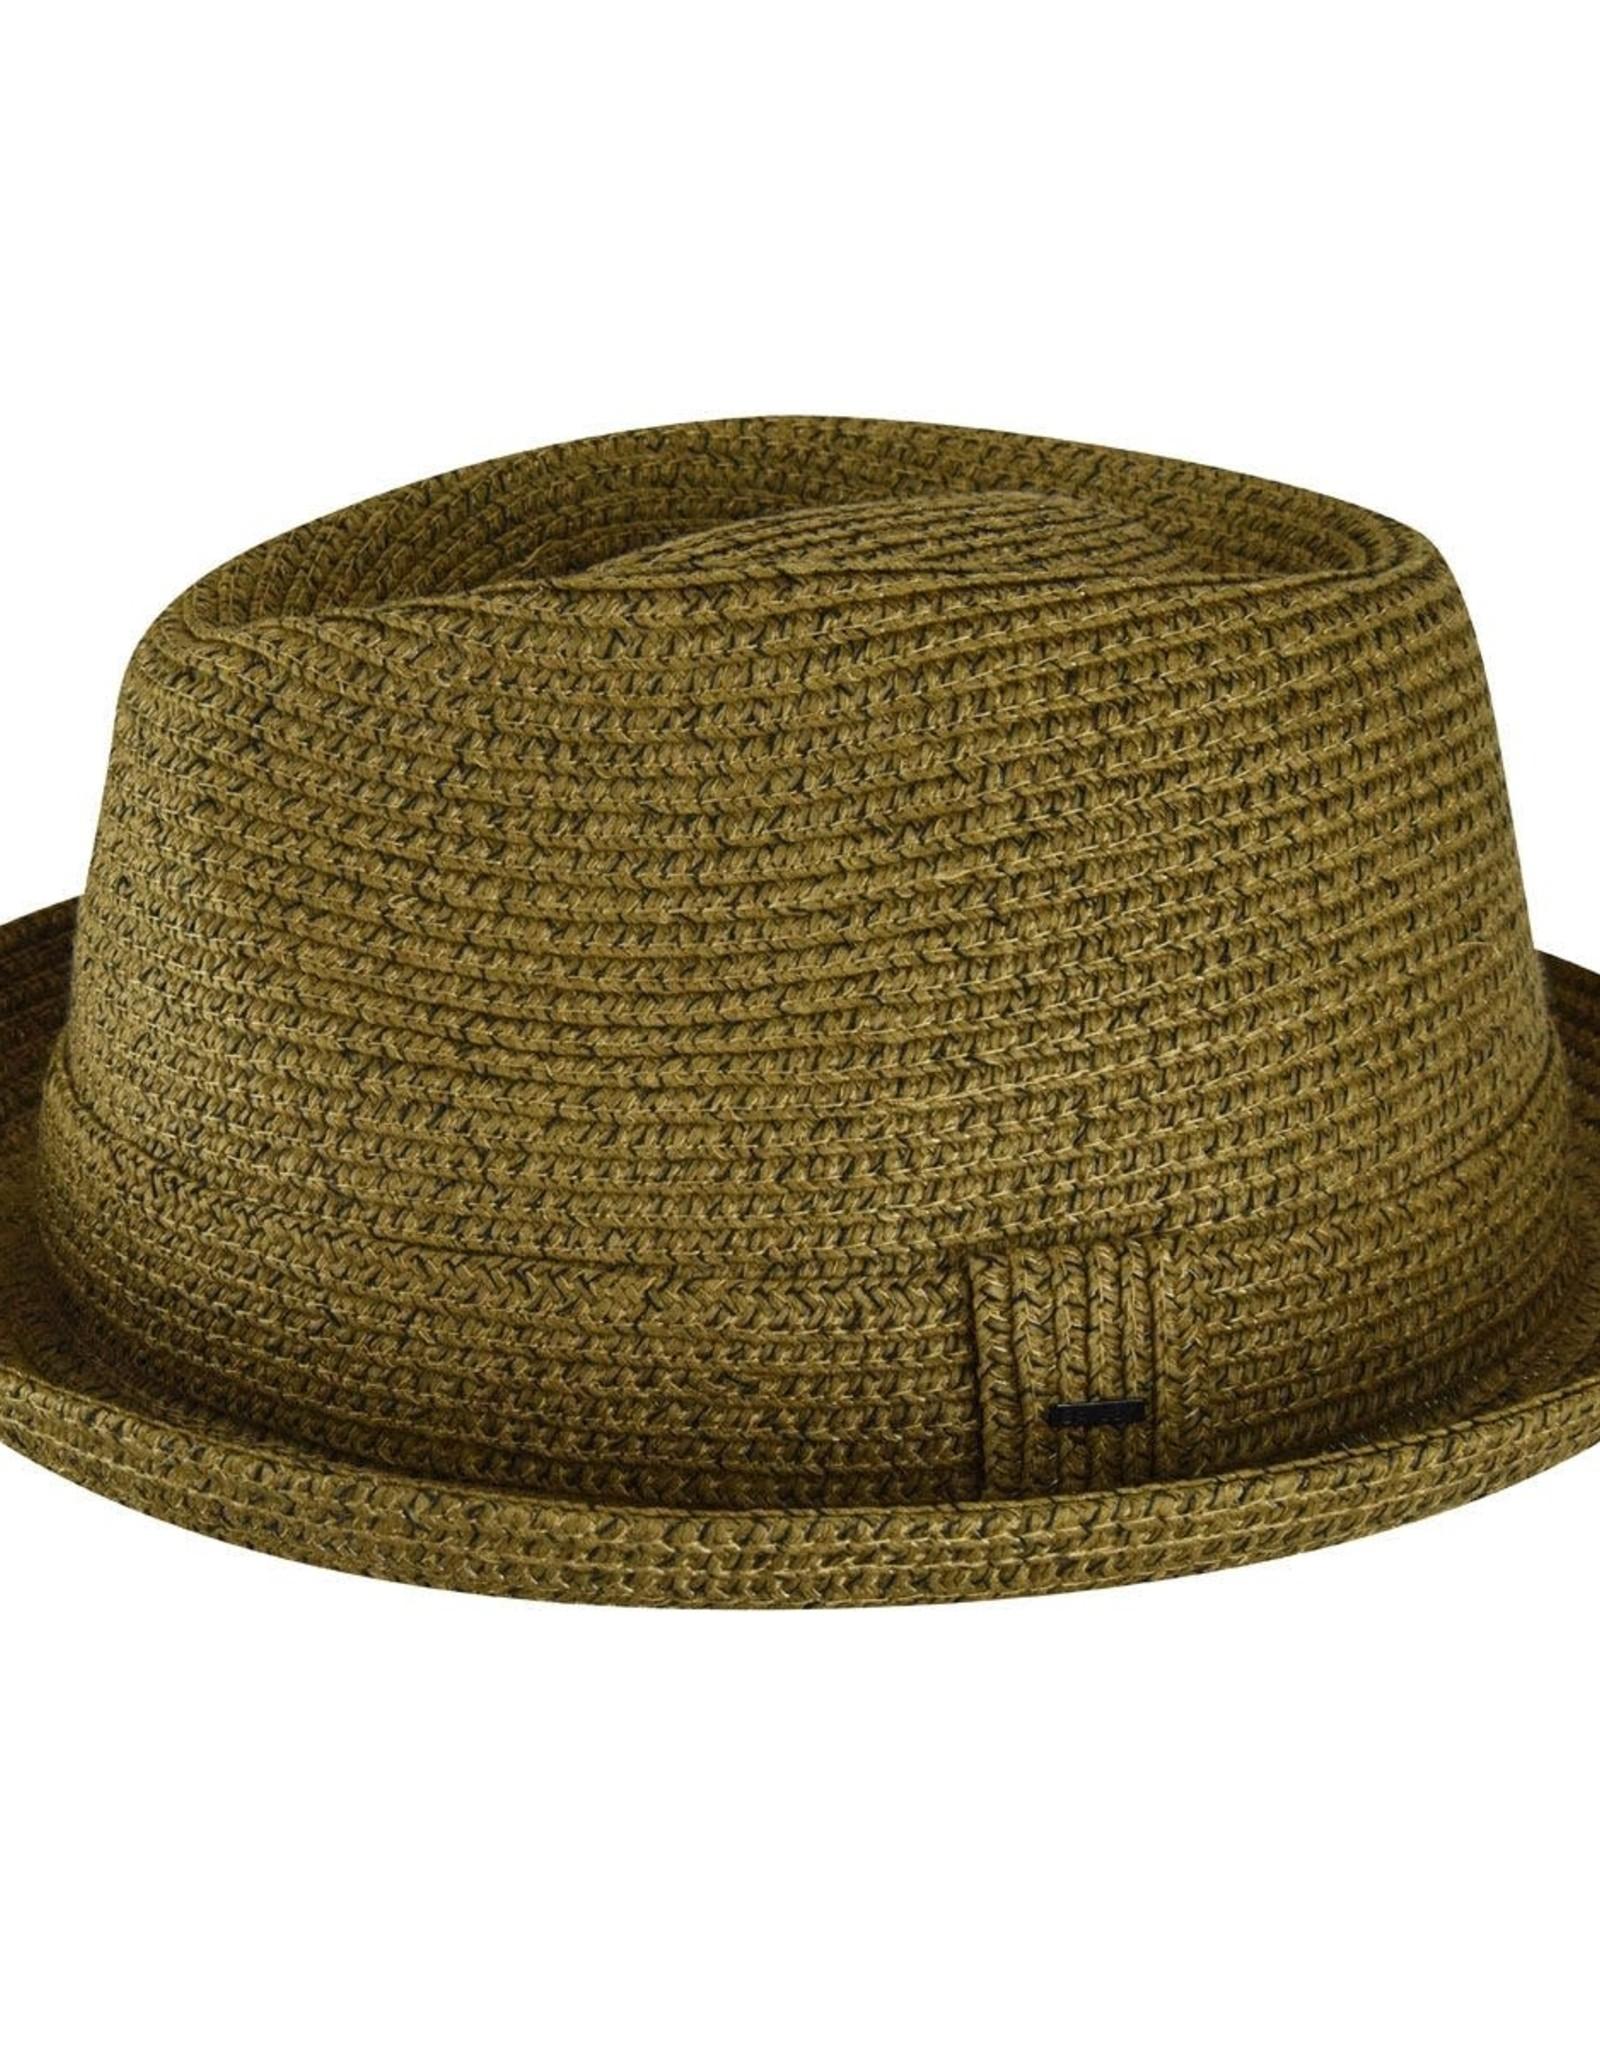 Bailey Hat Co. HAT-TURNED UP BRIM-BILLY, STRAW BRAID